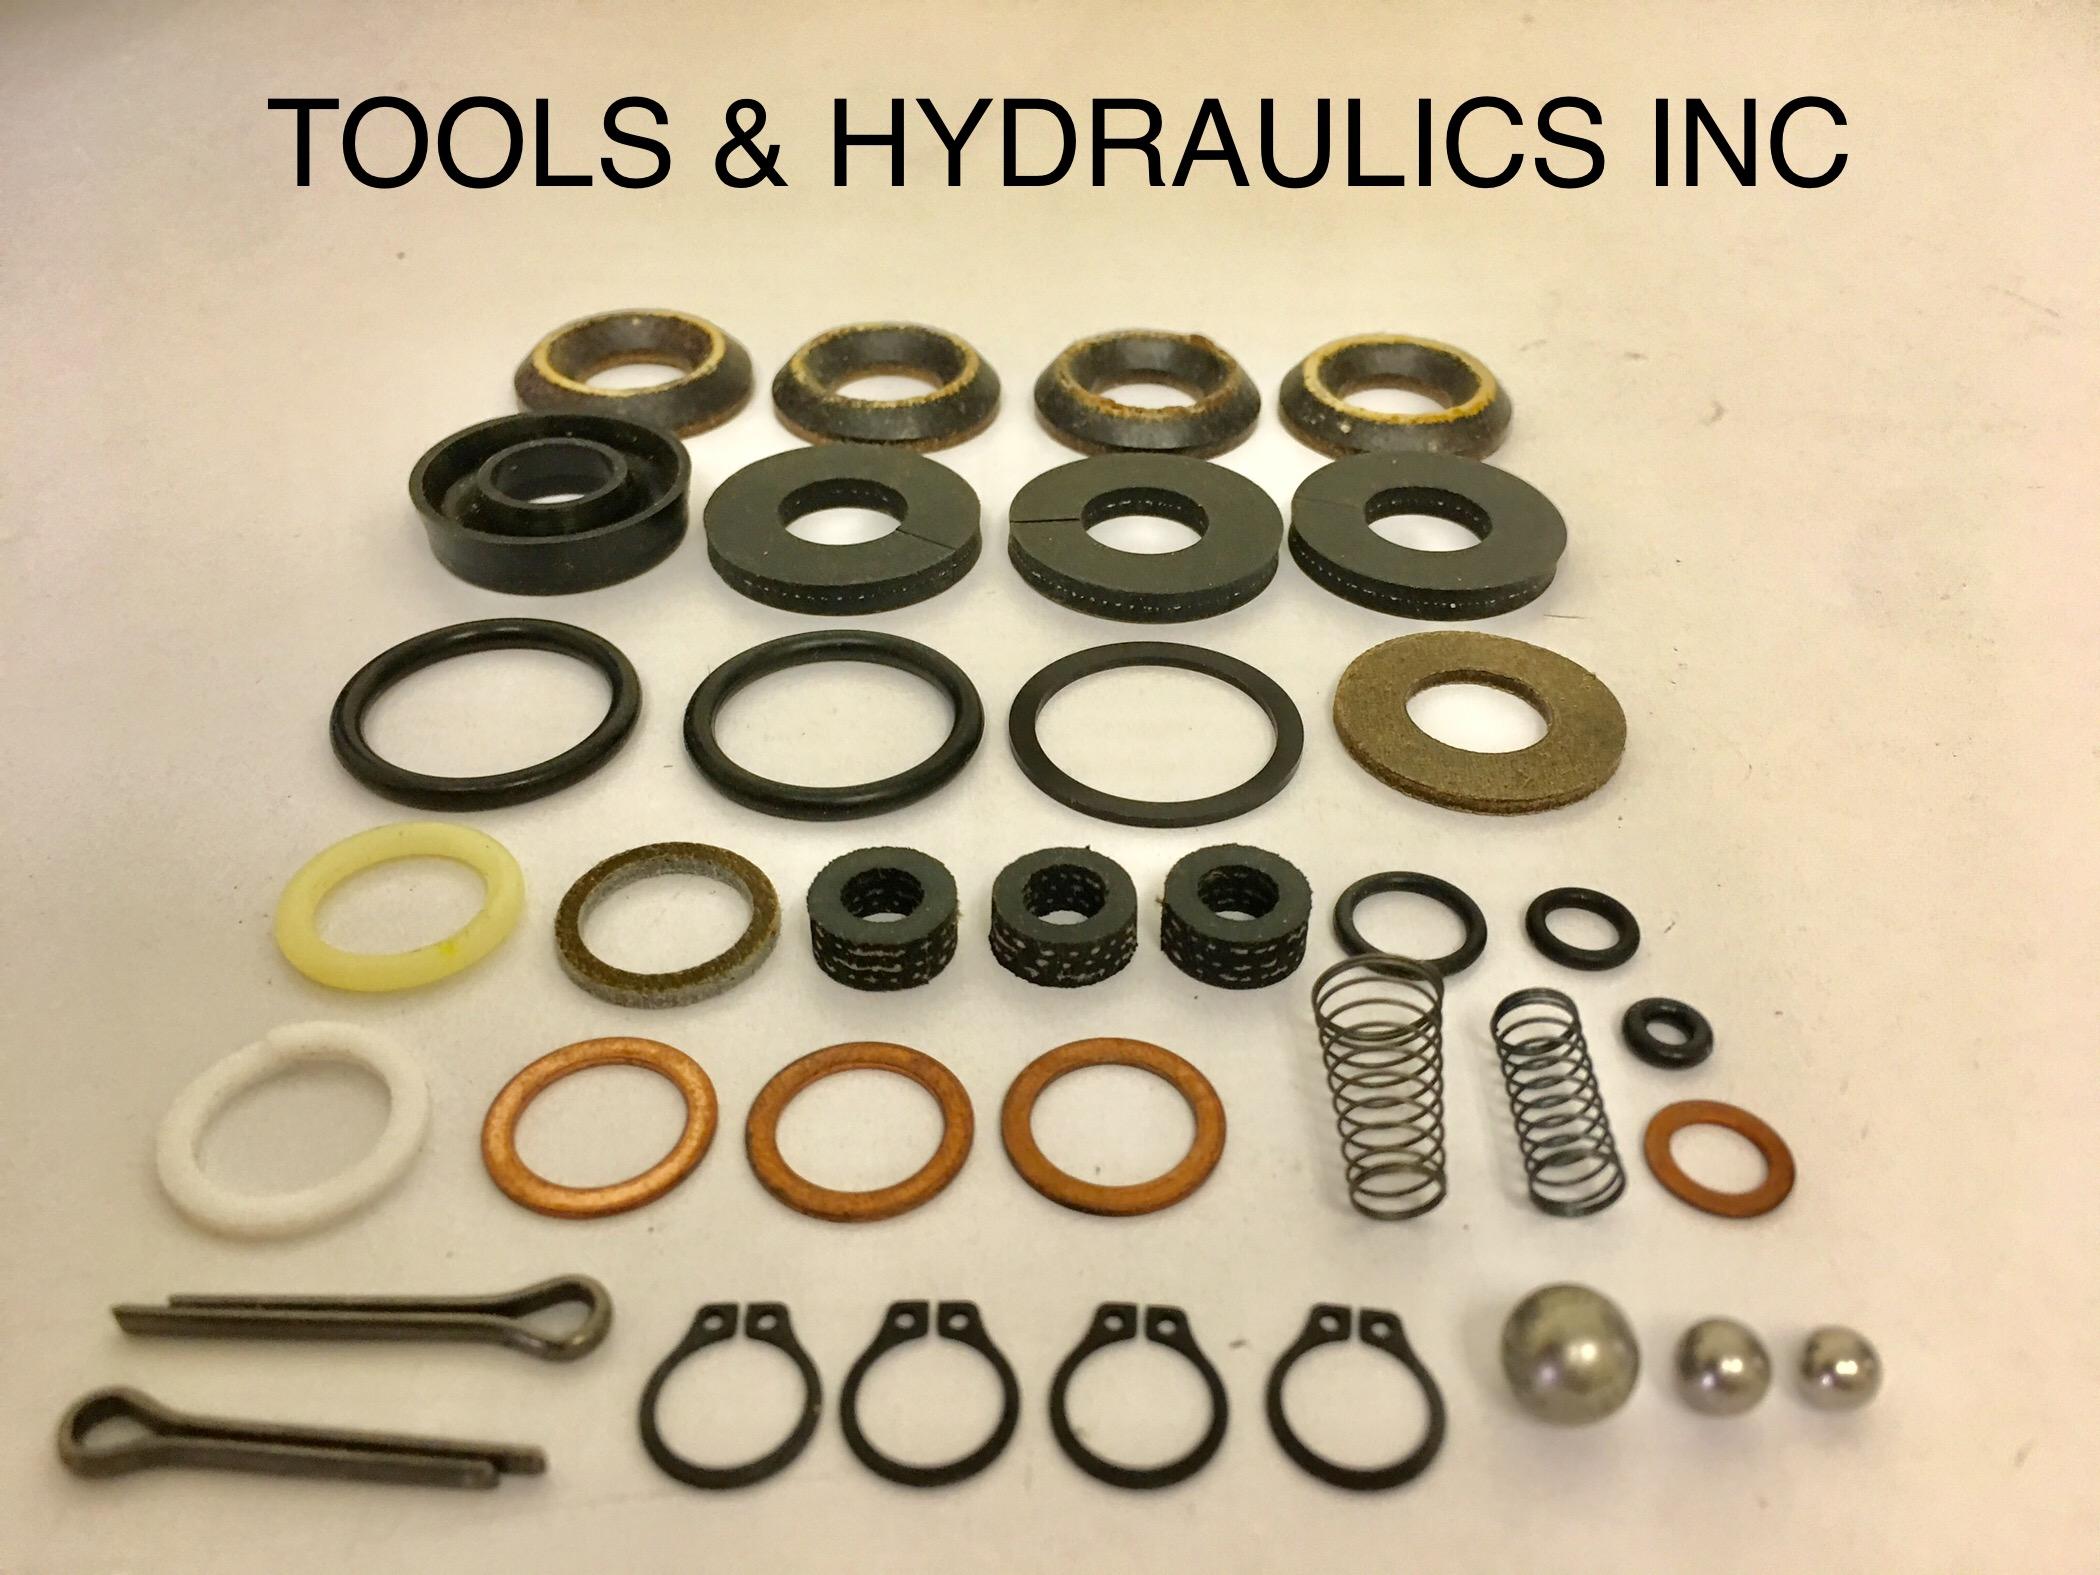 Tn Blackhawk Jacks Repair Kits Hydraulic Jack Diagram Pallet Parts 67574 Kit Hand Pump4500